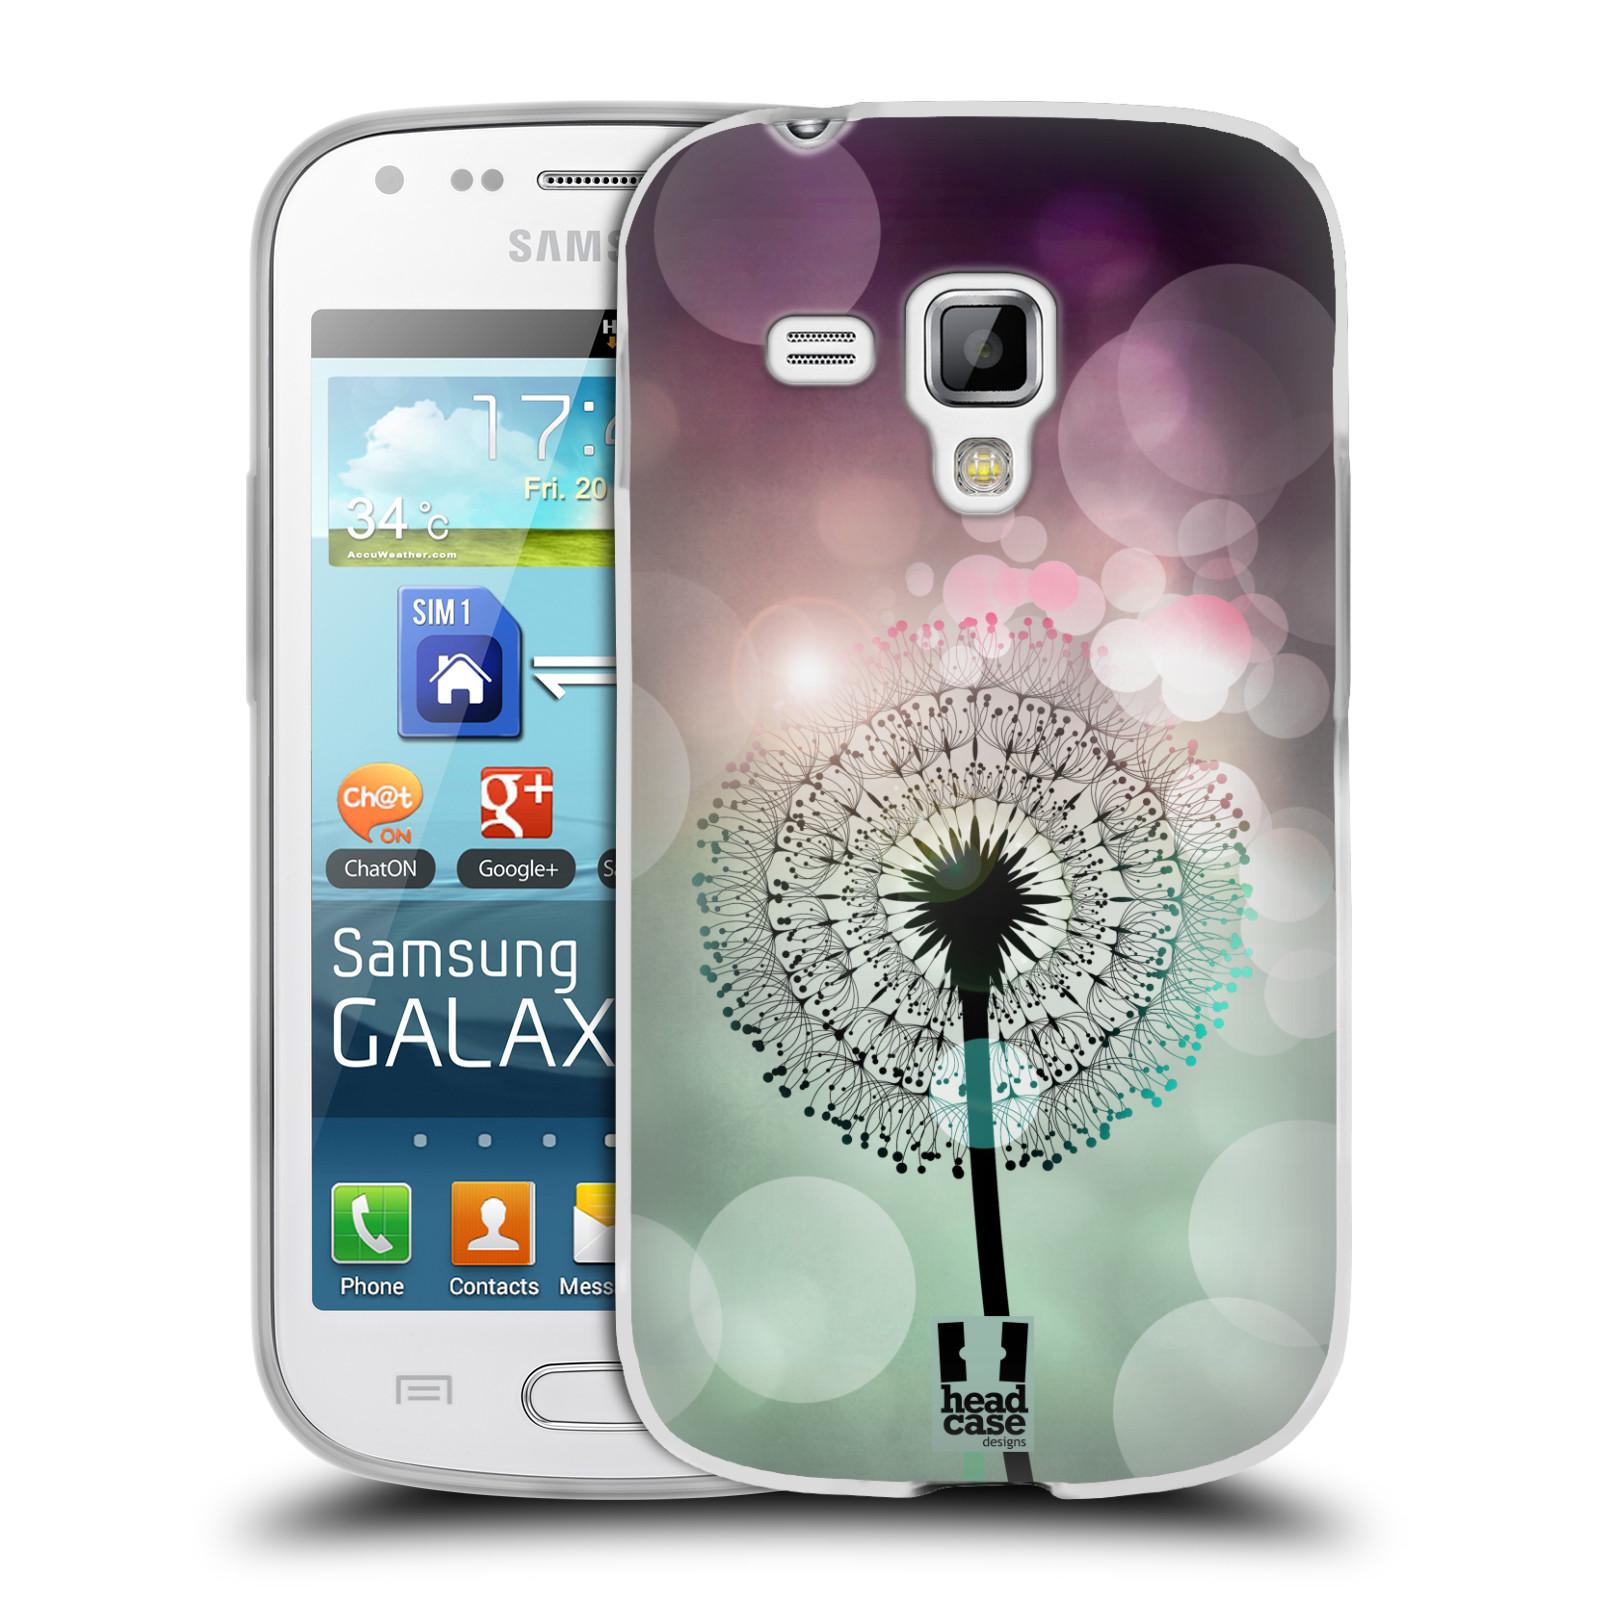 Silikonové pouzdro na mobil Samsung Galaxy Trend HEAD CASE Pampeliškové odlesky (Silikonový kryt či obal na mobilní telefon Samsung Galaxy Trend GT-S7560)